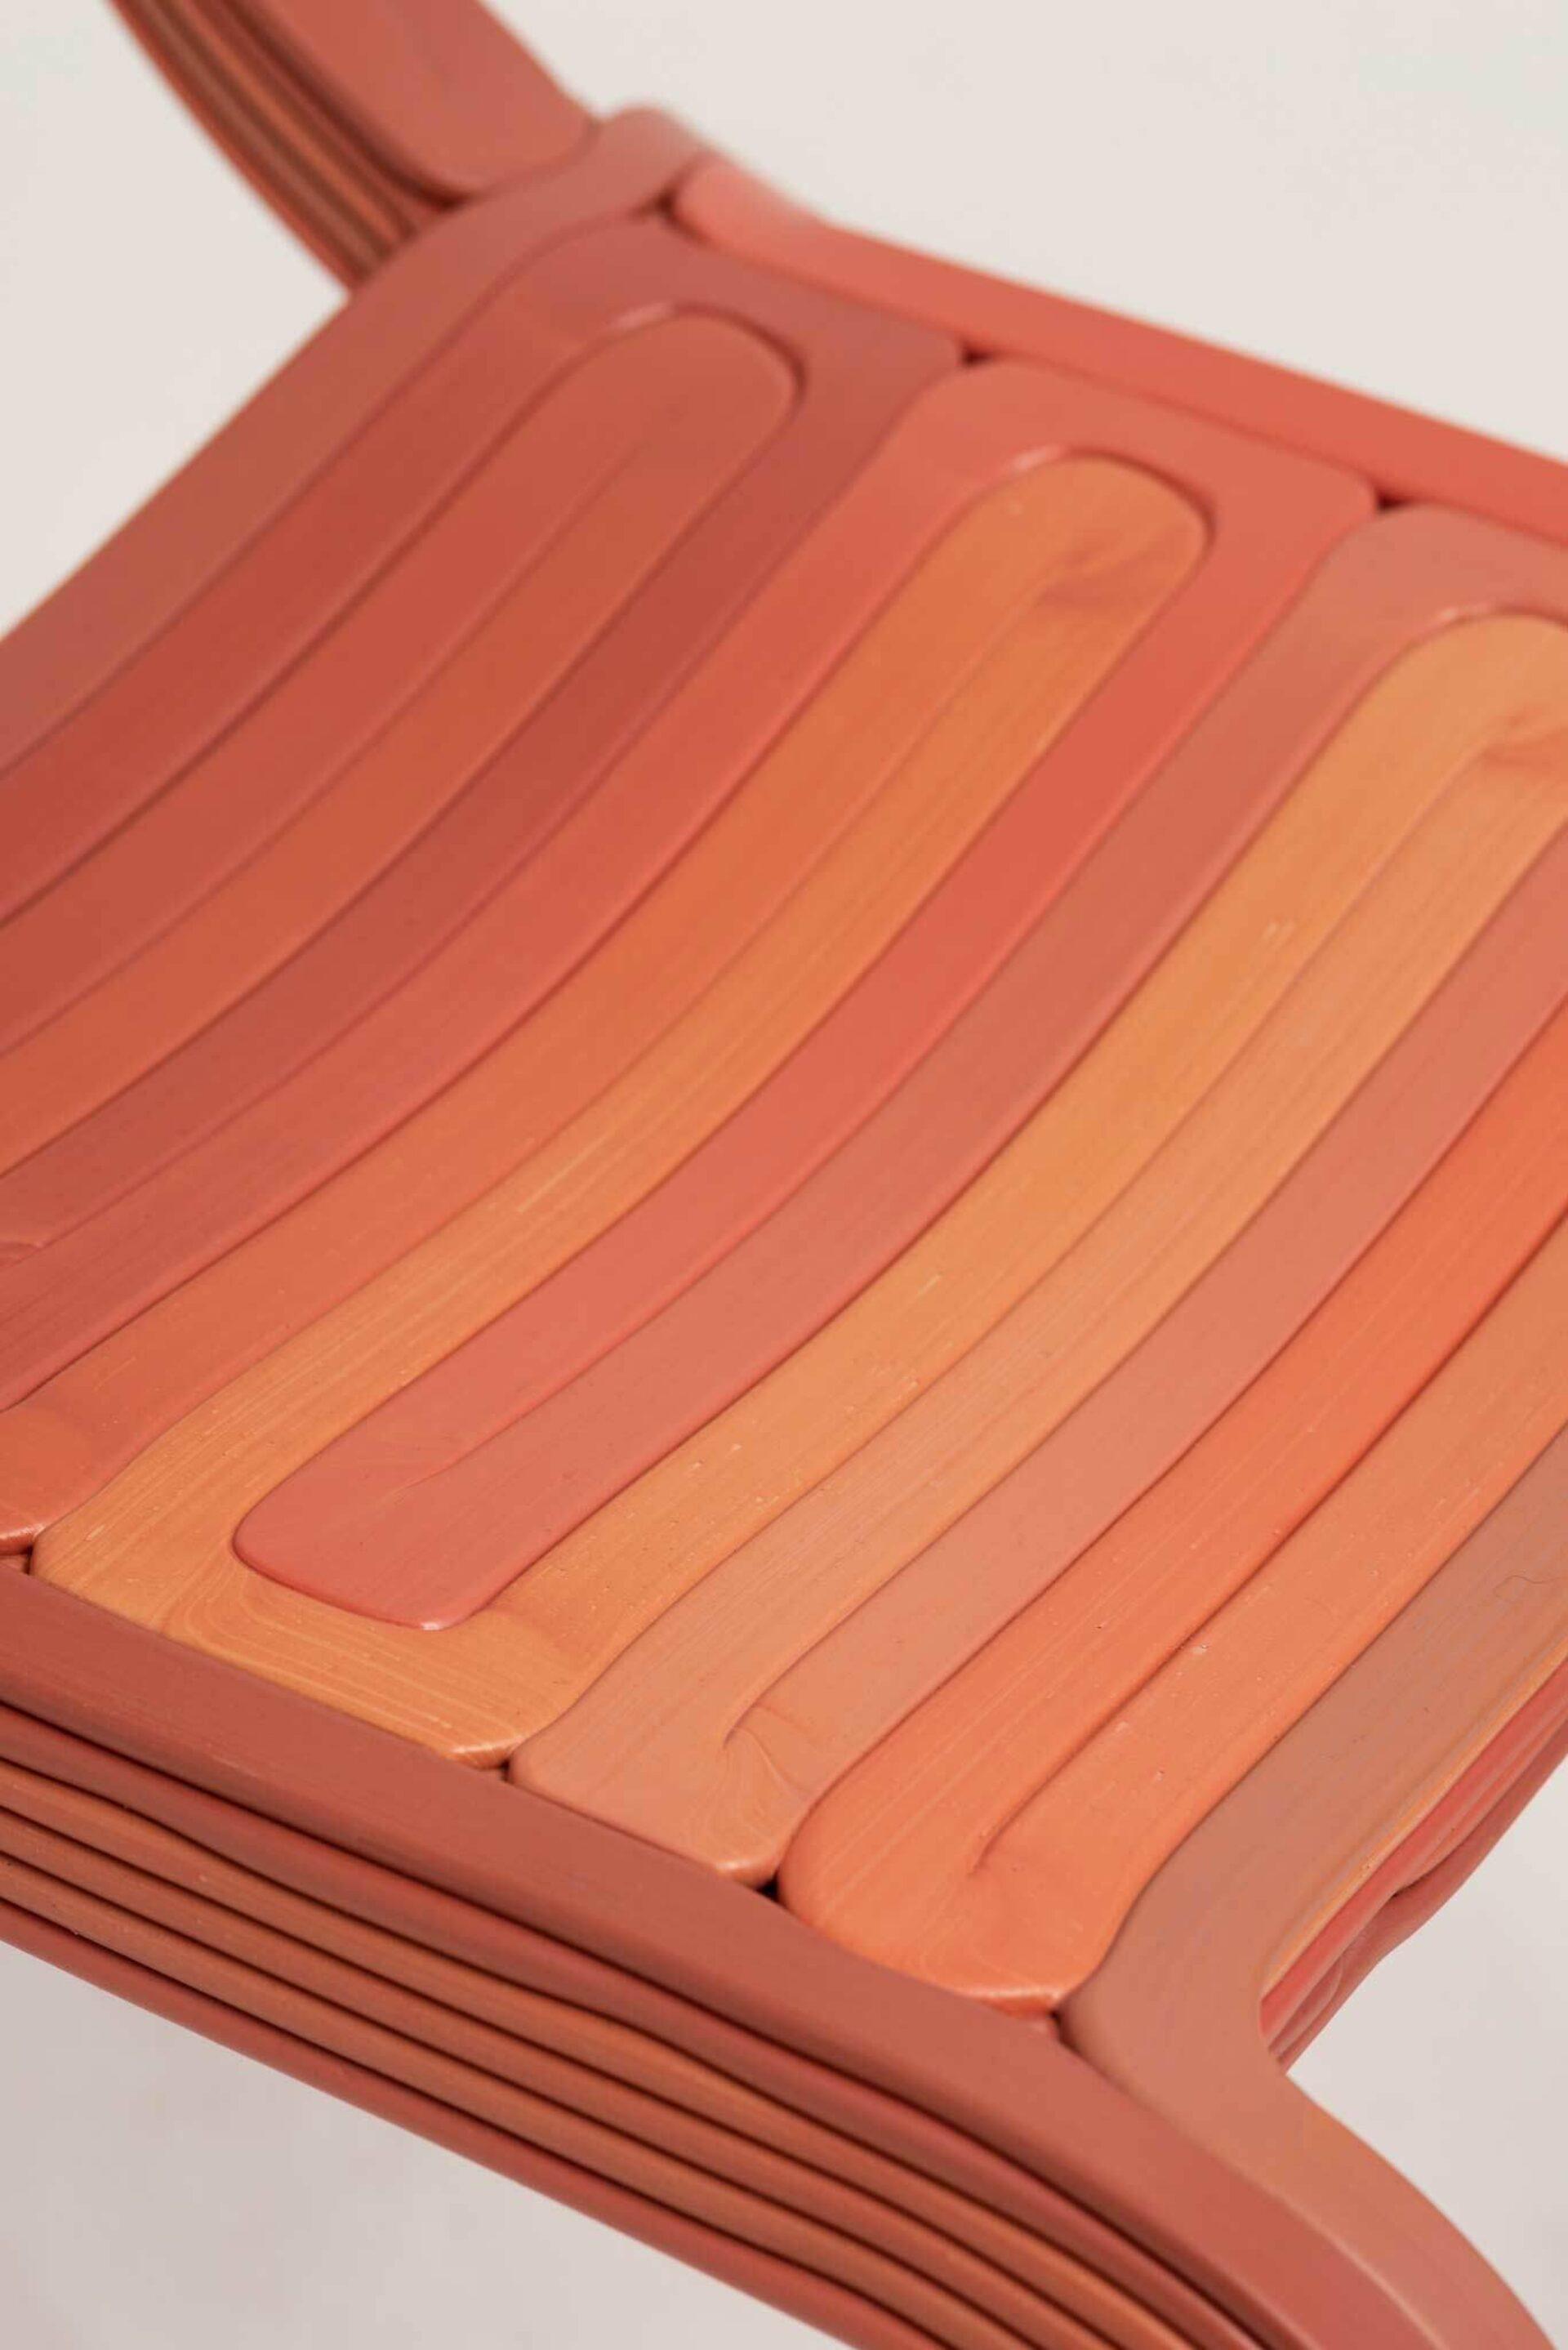 Kooij rvr chair ketchup detail 3d printed recycled plastic